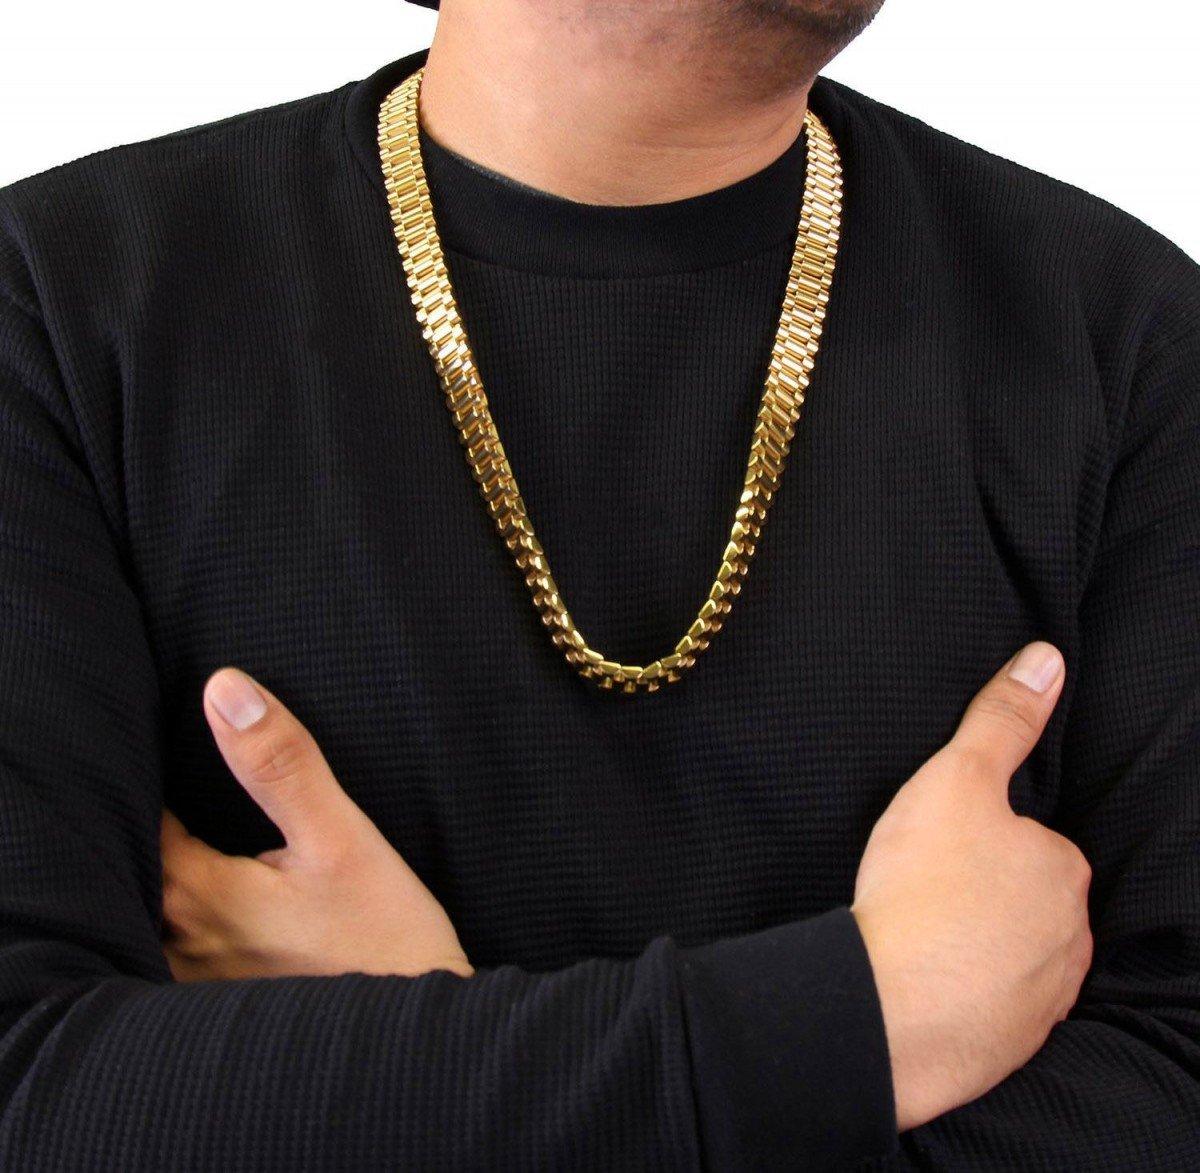 Золотые цепи мужские картинки